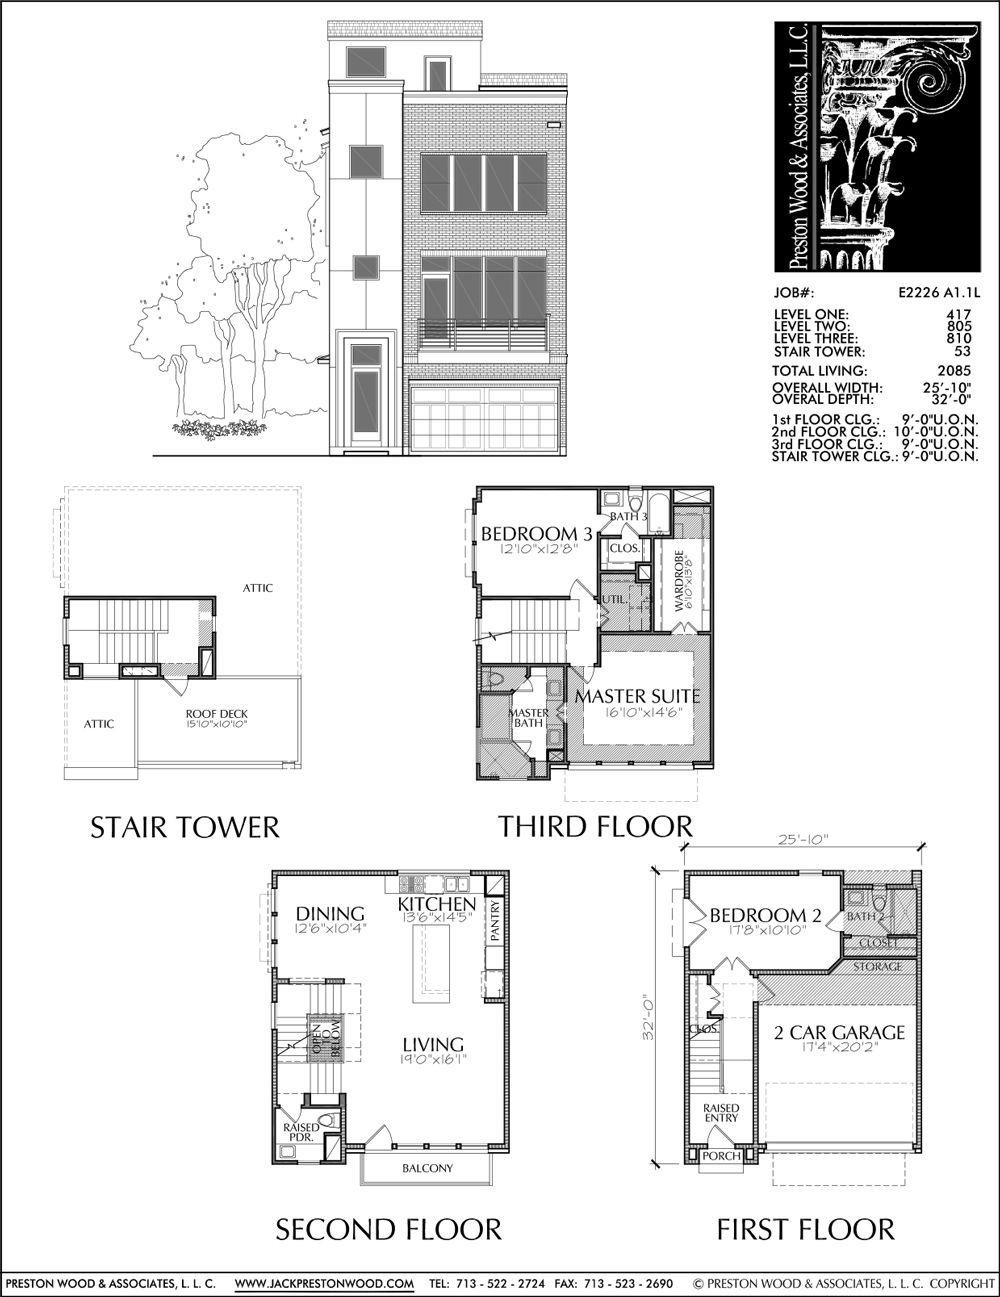 Townhome Plan E2226 A1 1 House layout plans Narrow lot